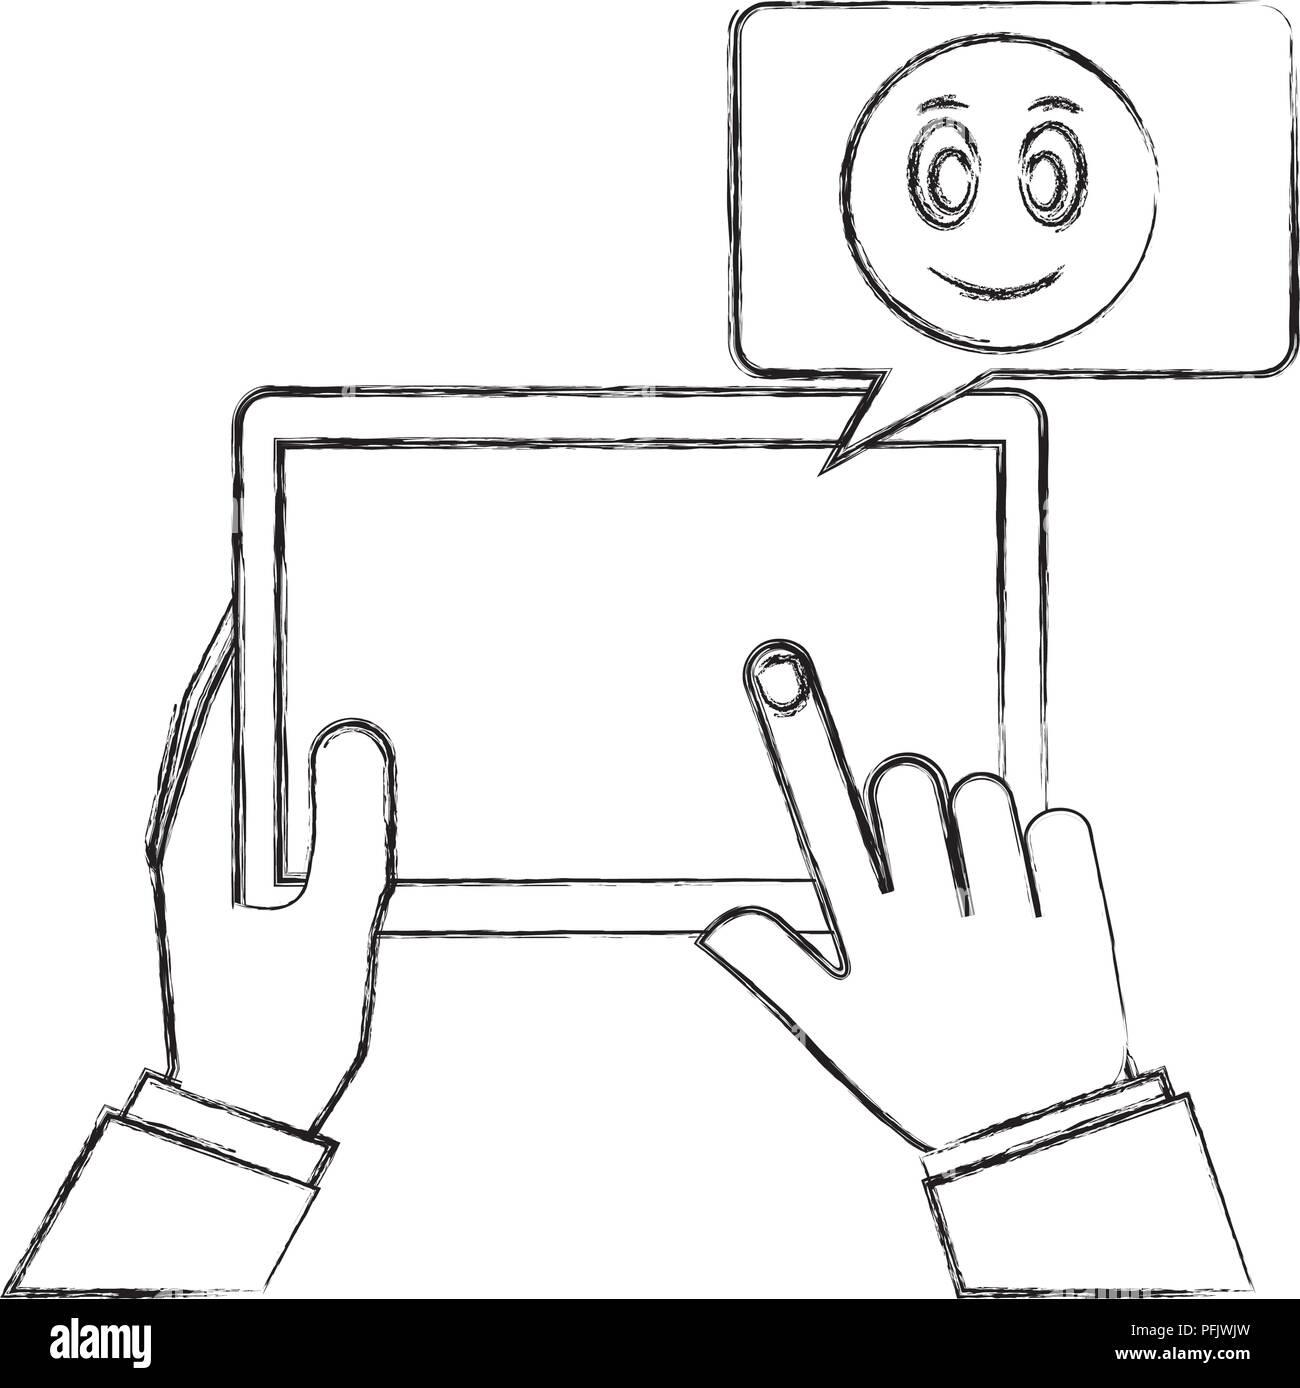 Happy Emoji Stock Photos & Happy Emoji Stock Images - Alamy